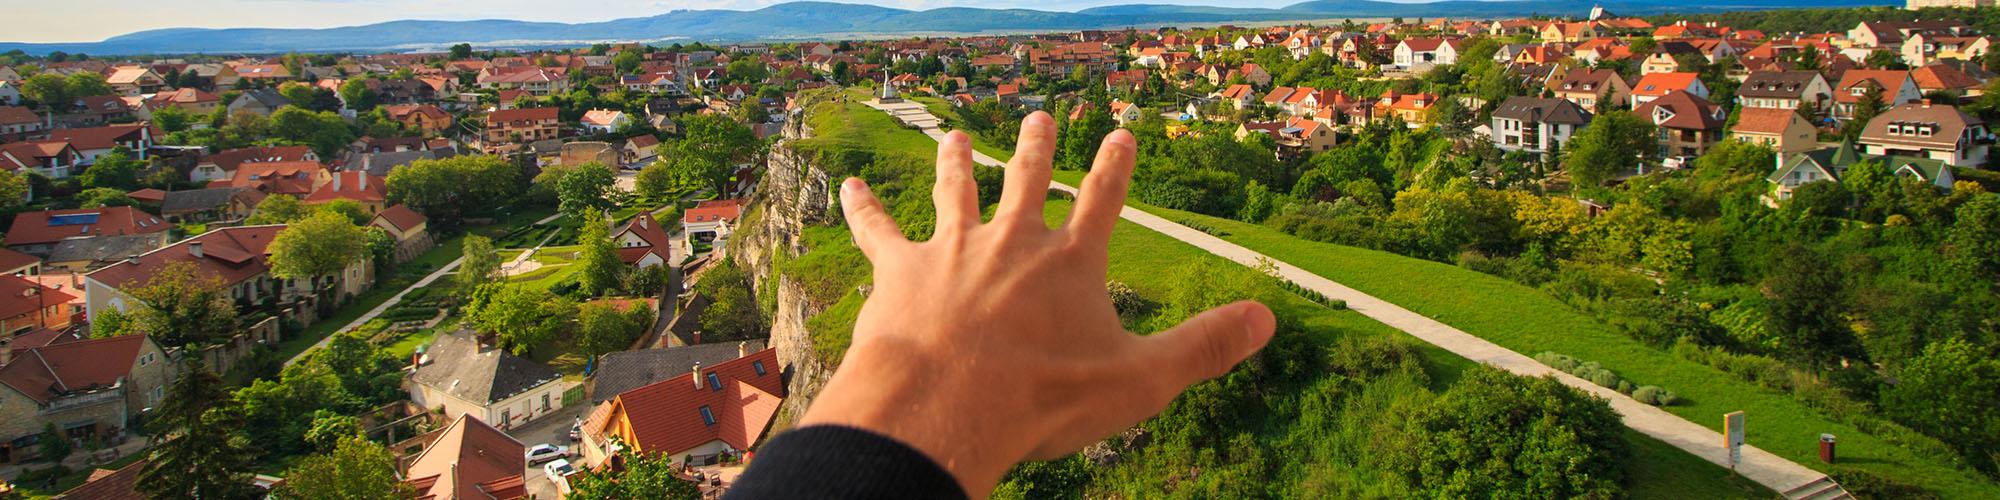 Verkaufte Immobilien in Herne